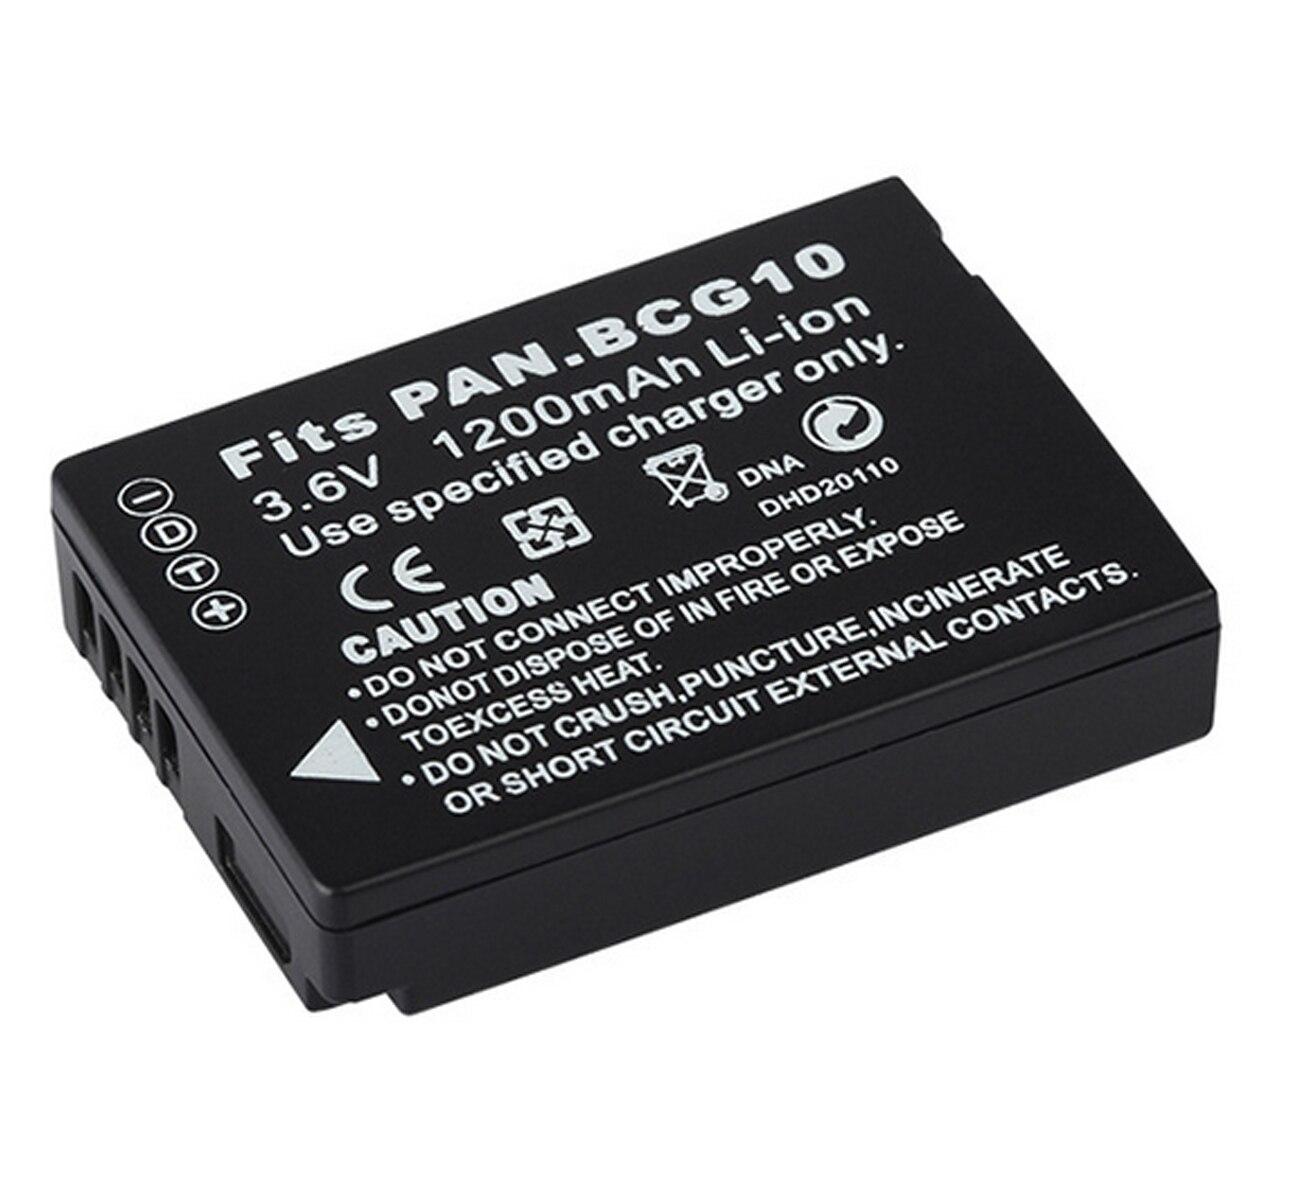 Bateria para panasonic lumix DMC-3D1, DMC-ZX1, DMC-ZX3, DMC-ZR1, DMC-ZR3, DMC-ZS1, DMC-ZS3, DMC-ZS5, DMC-ZS6,, câmera digital